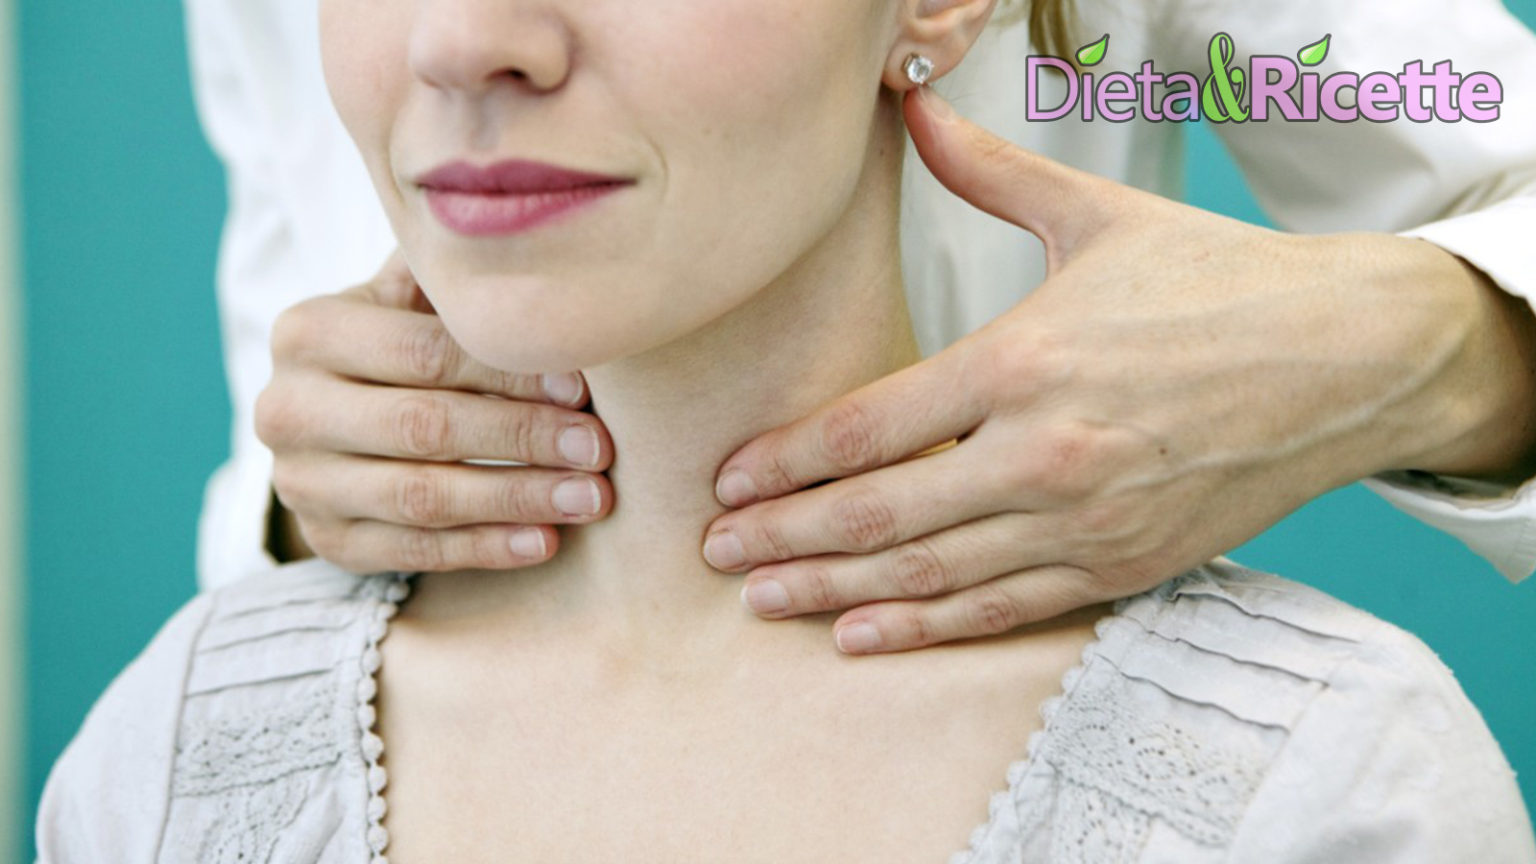 » Dieta per ipotiroidismo e menopausa